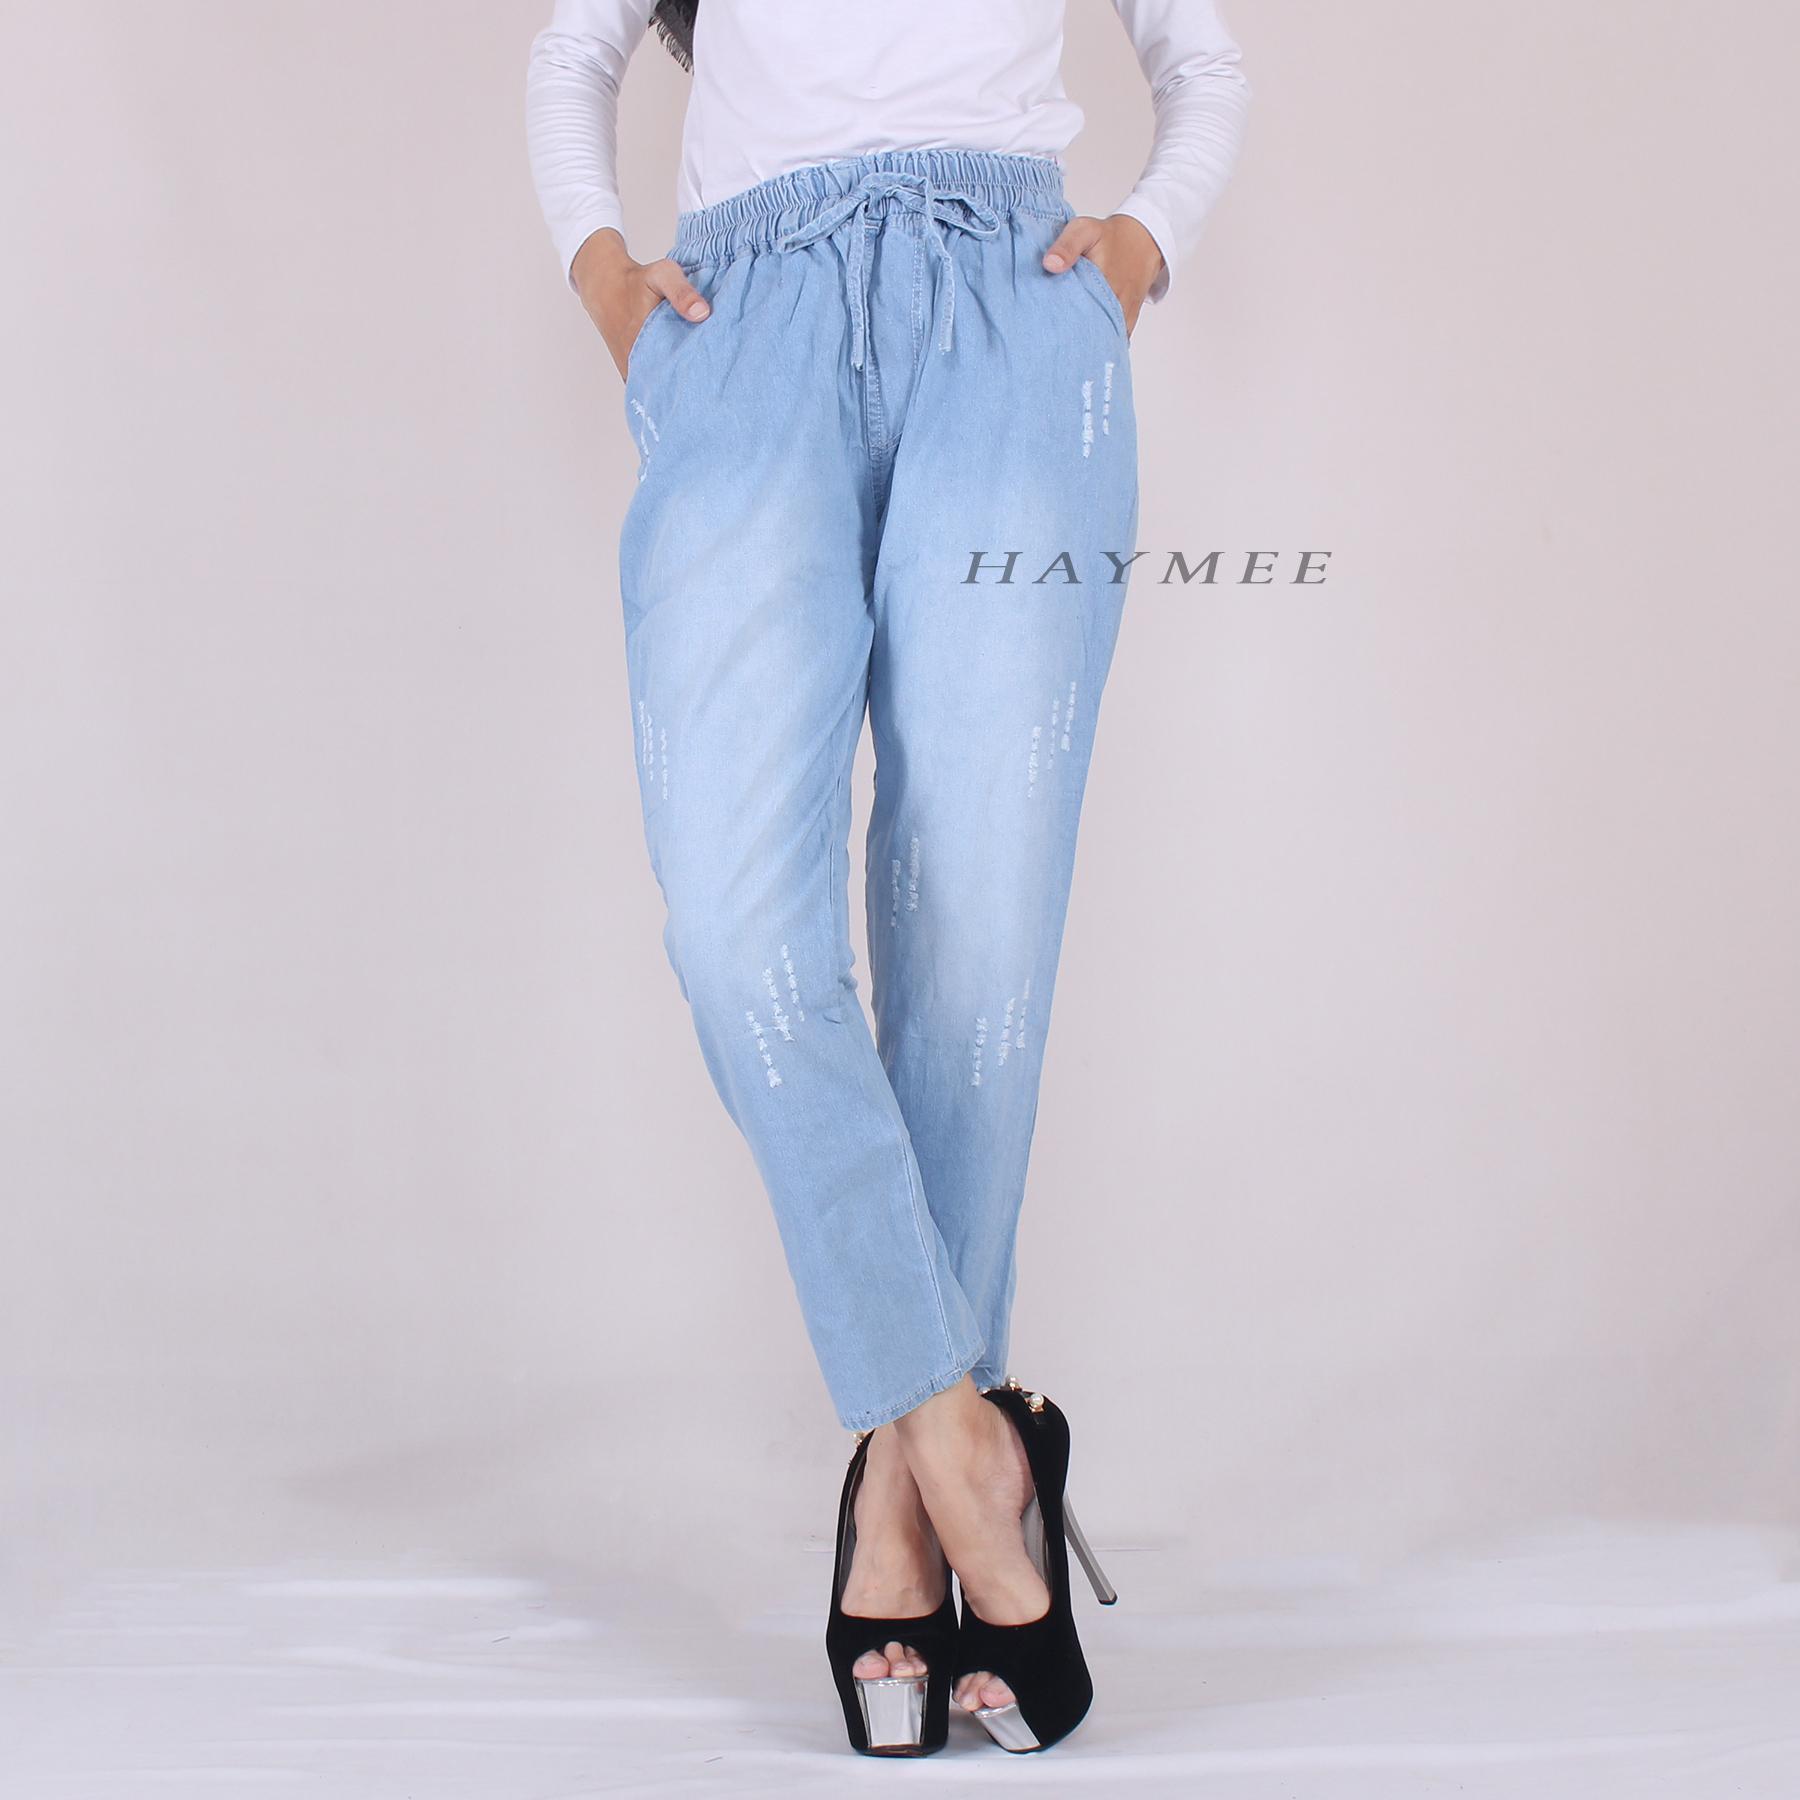 Haymeestore Celana Boyfriend Jeans Wanita Motif Sobek Celana Denim Cewek Bawahan Jeans Blue